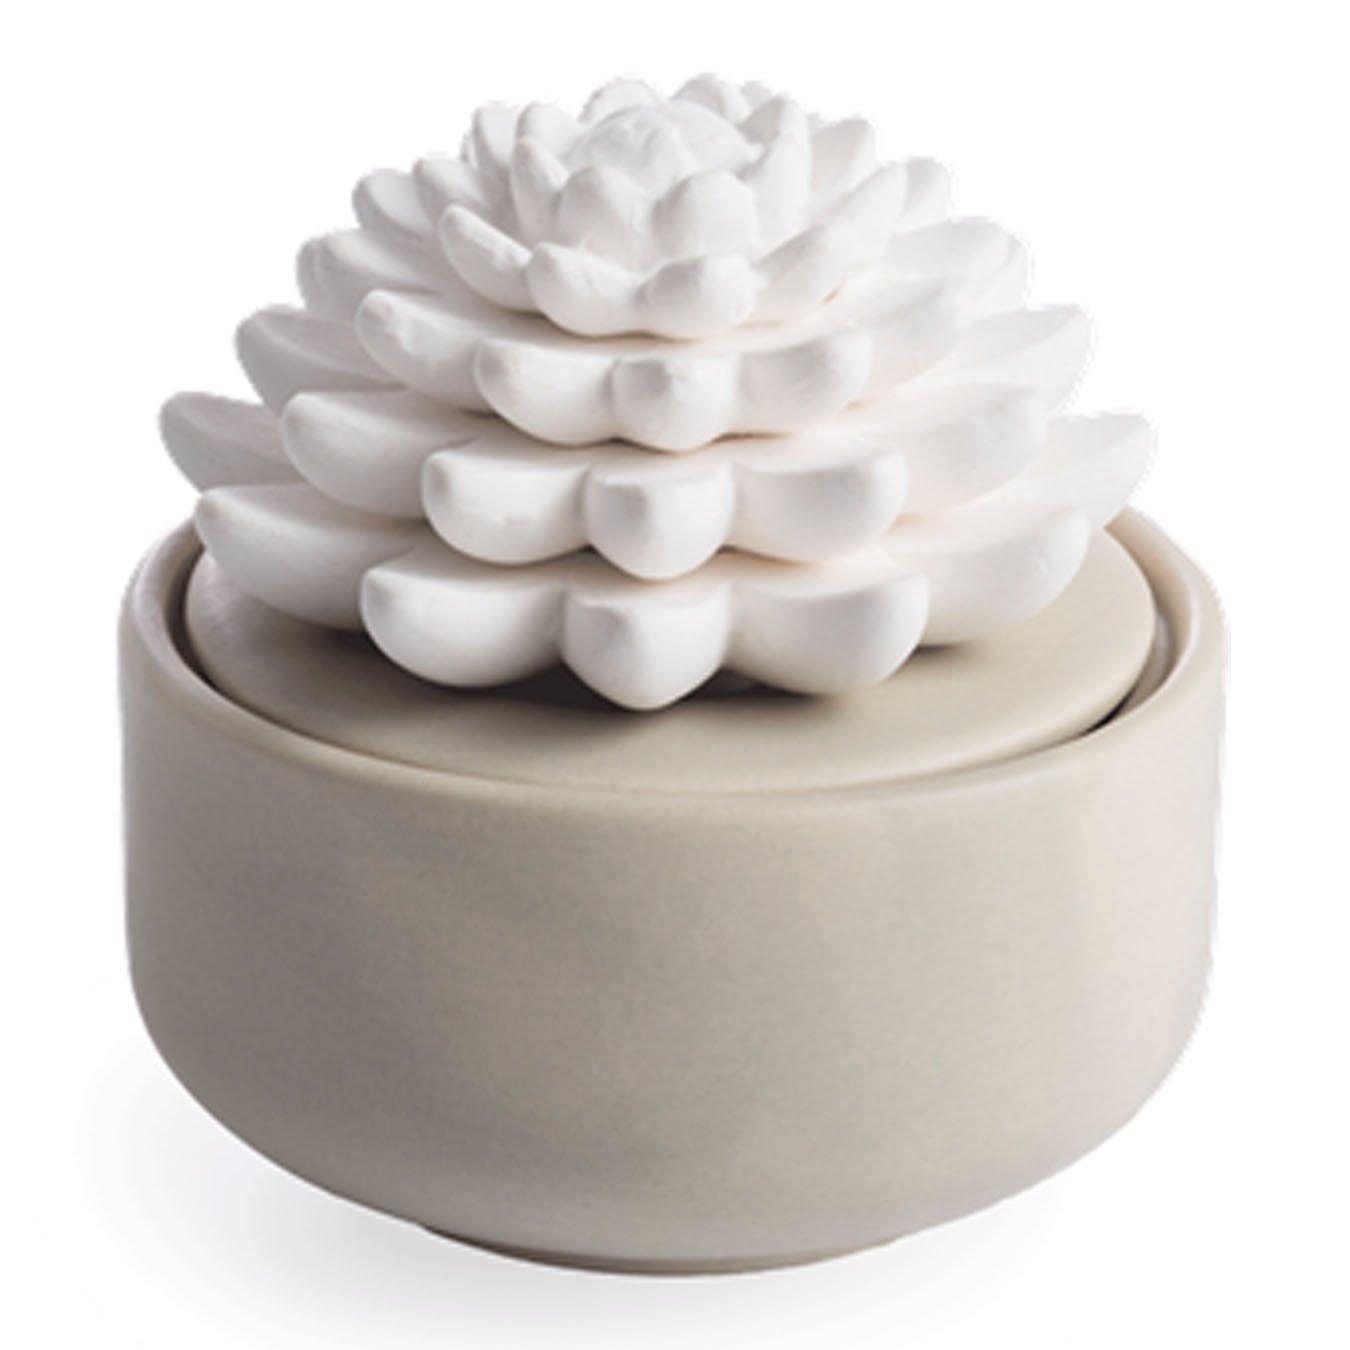 Succulent Porcelain Essential Oil Diffuser